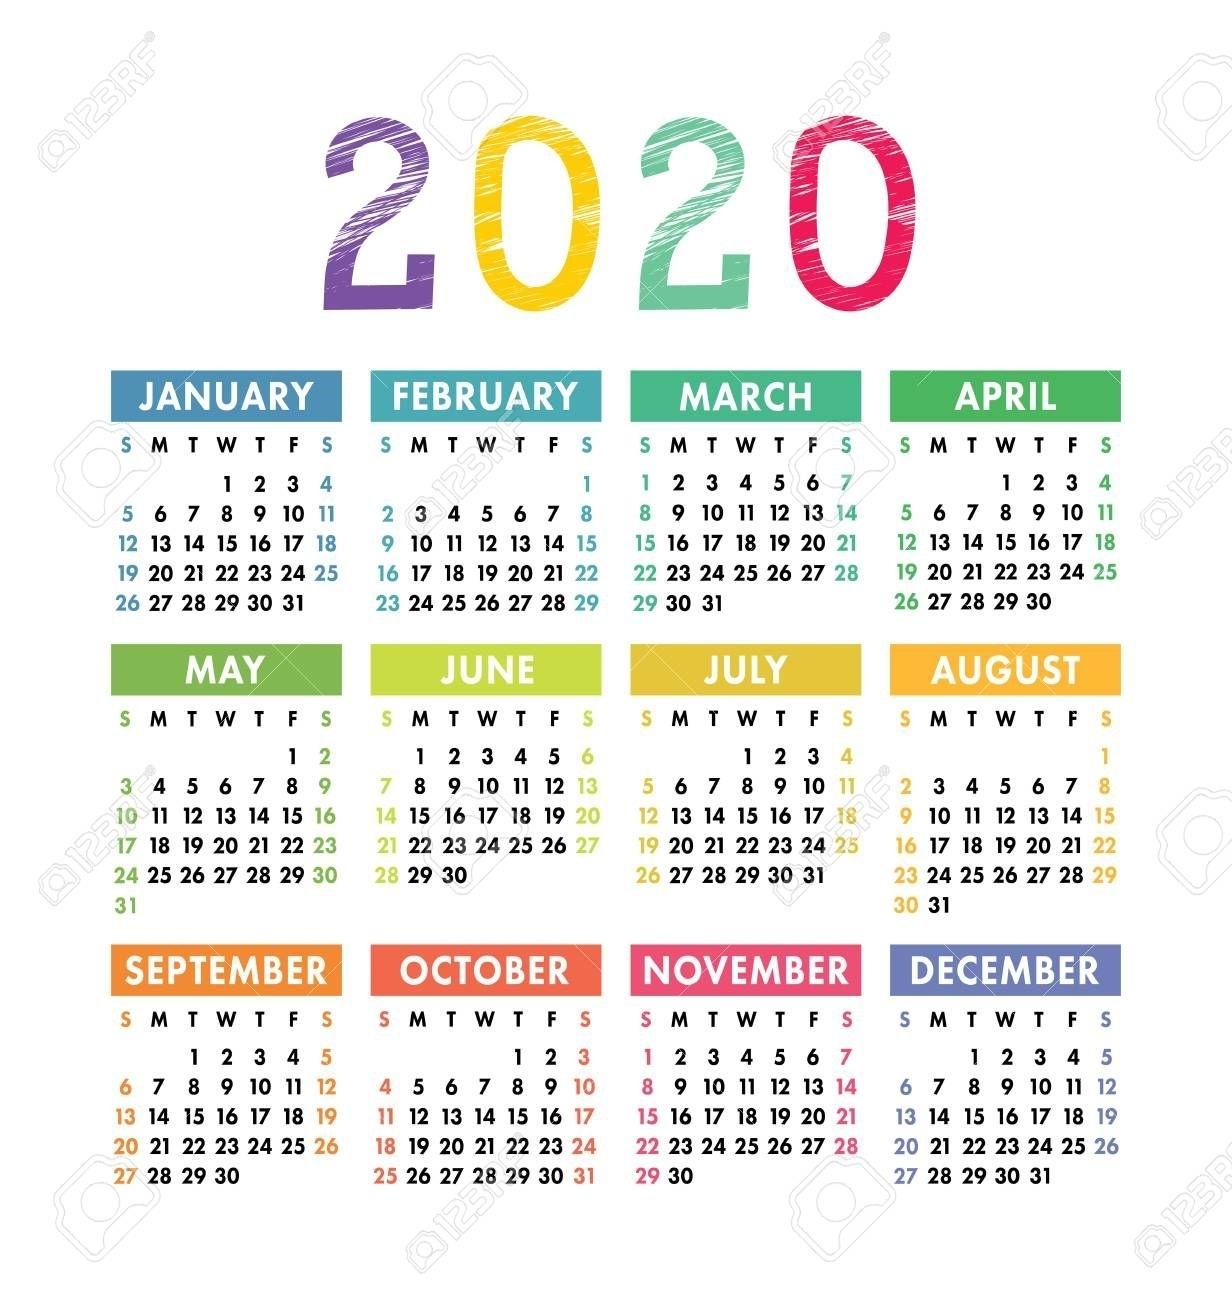 Calendar 2020 Year. Vector Pocket Or Wall Calender Template for Printable Calendars 2020 Pocket Size